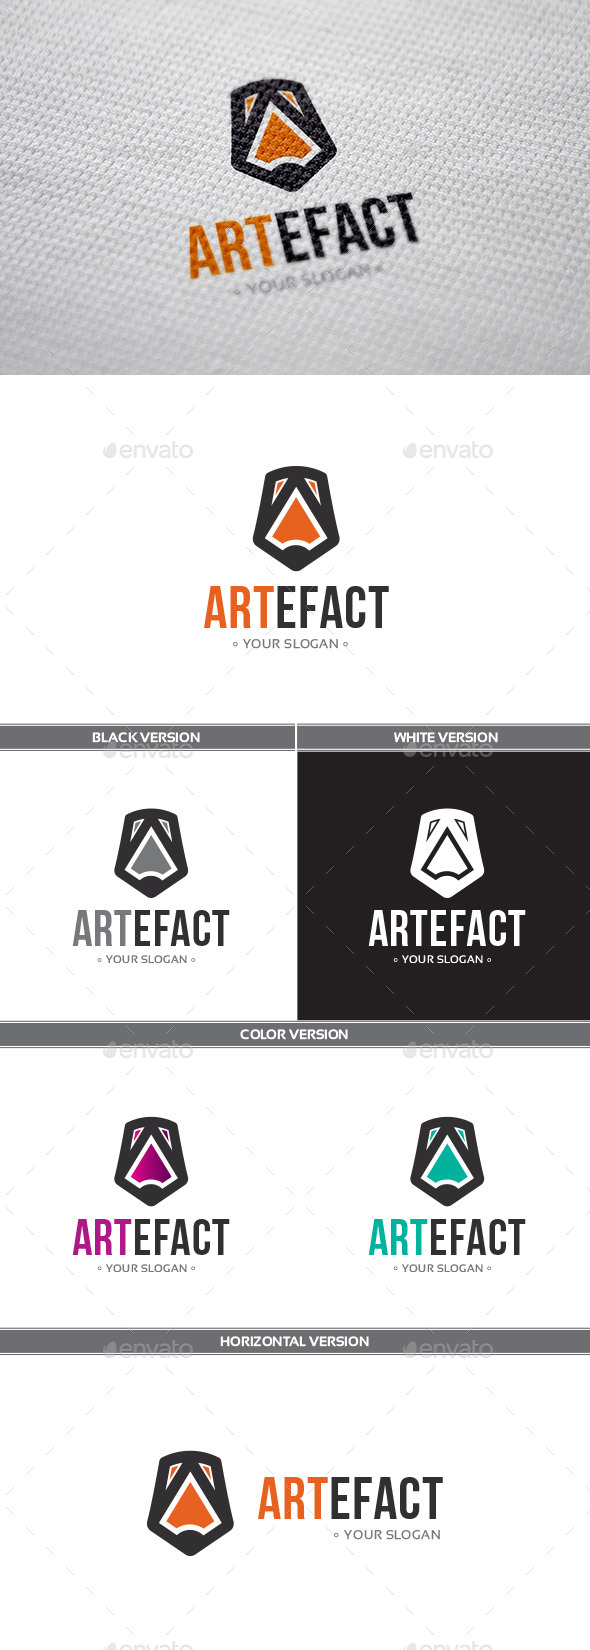 GraphicRiver Artefact Logo 9259627